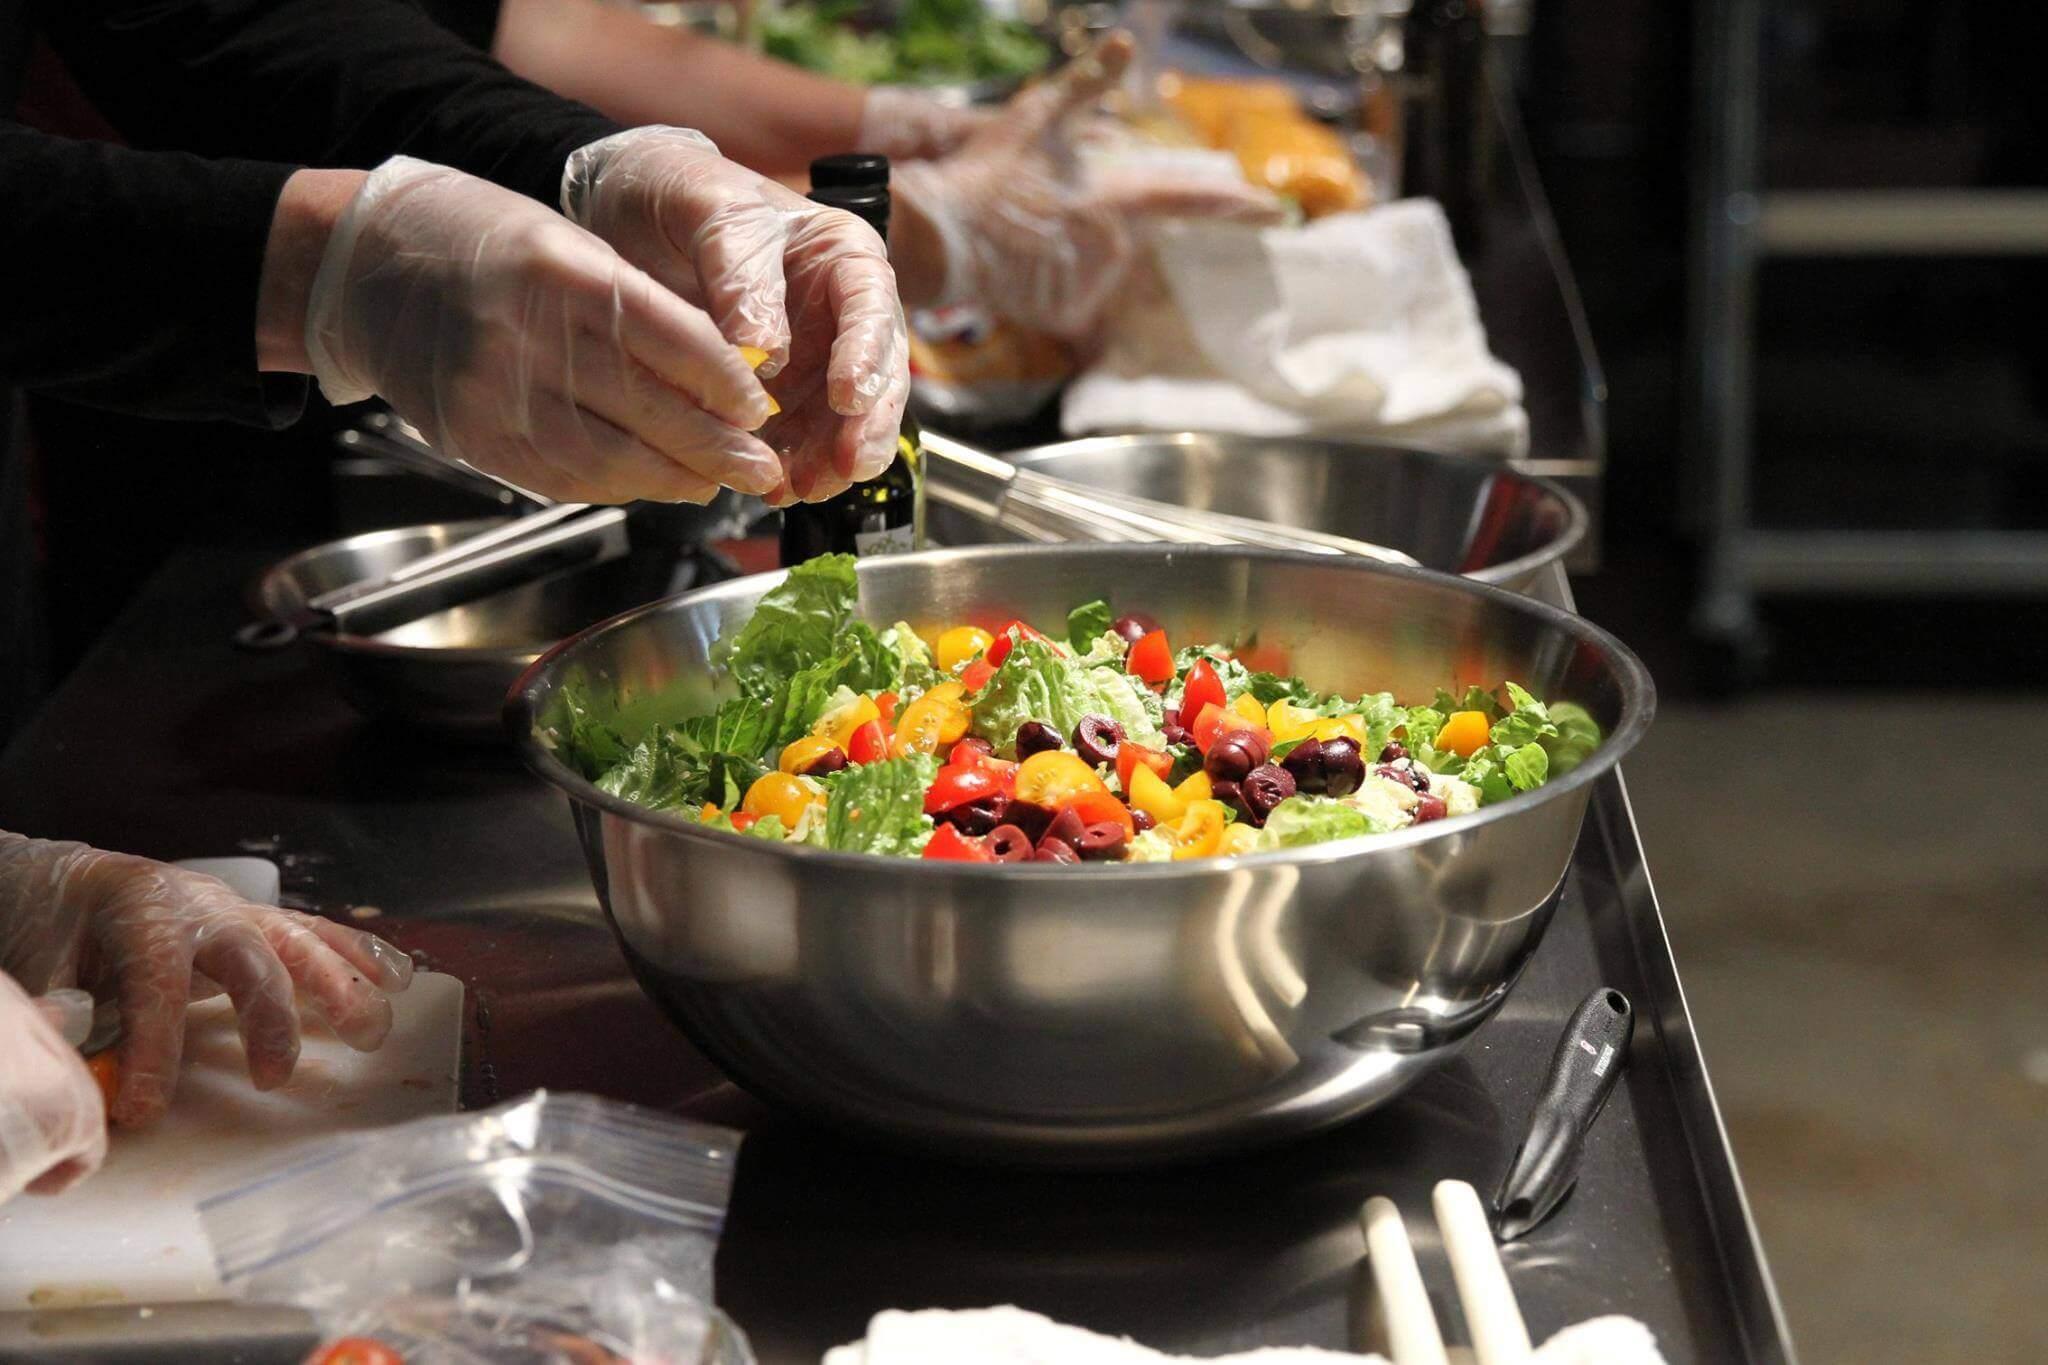 Salad as an Entree Class